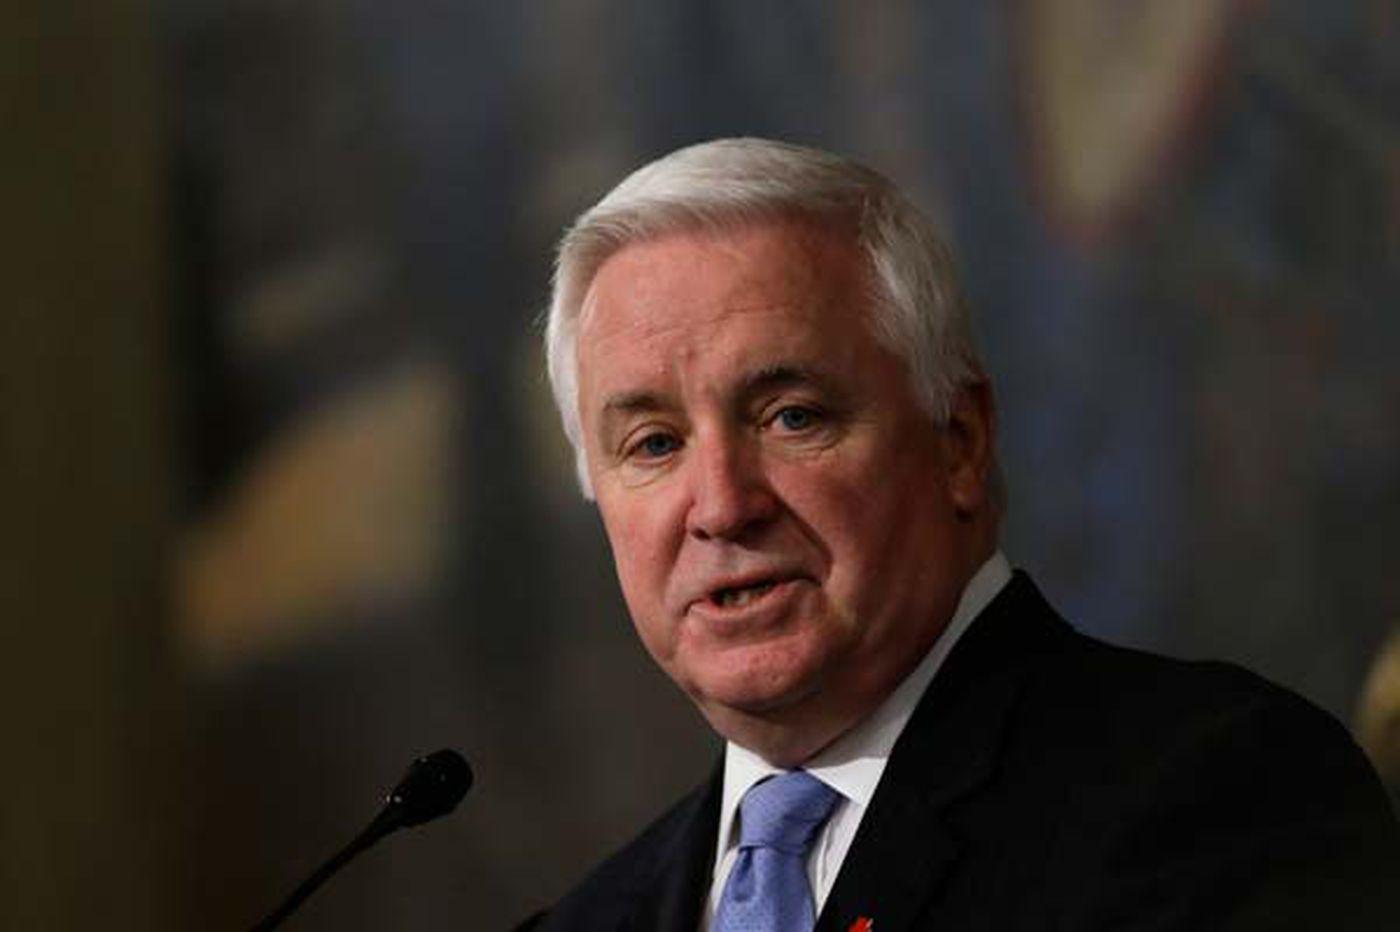 Corbett's proposed education funding falls short, advocates say